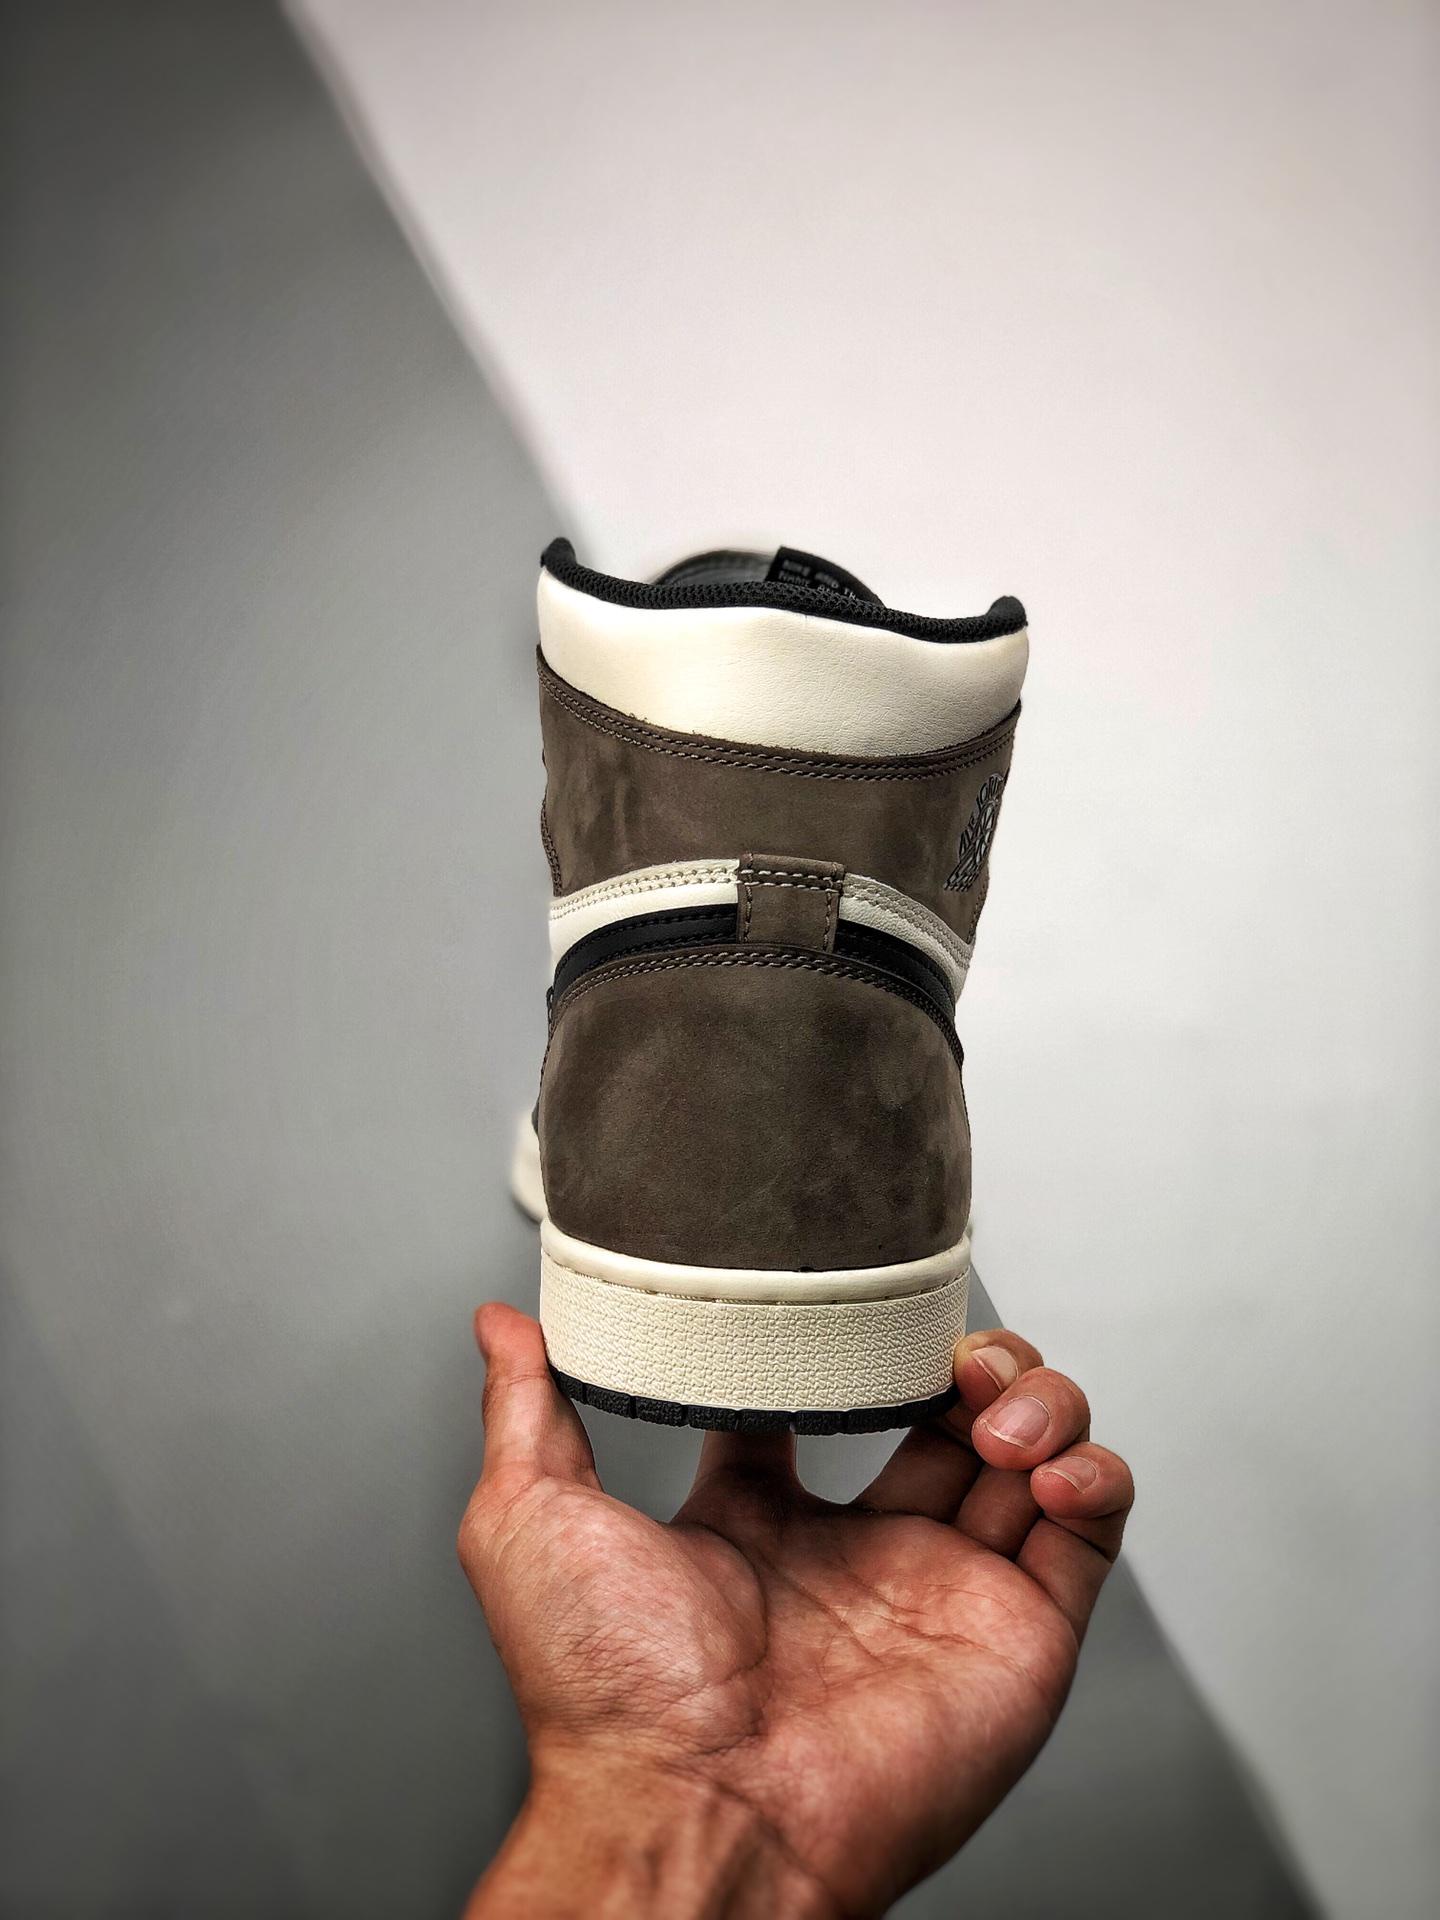 "S2纯原高帮 Air Jordan 1 Retro ""Dark Mocha"" 小倒钩/摩卡咖啡色 货号555088-105_河源裸鞋怎么拿"